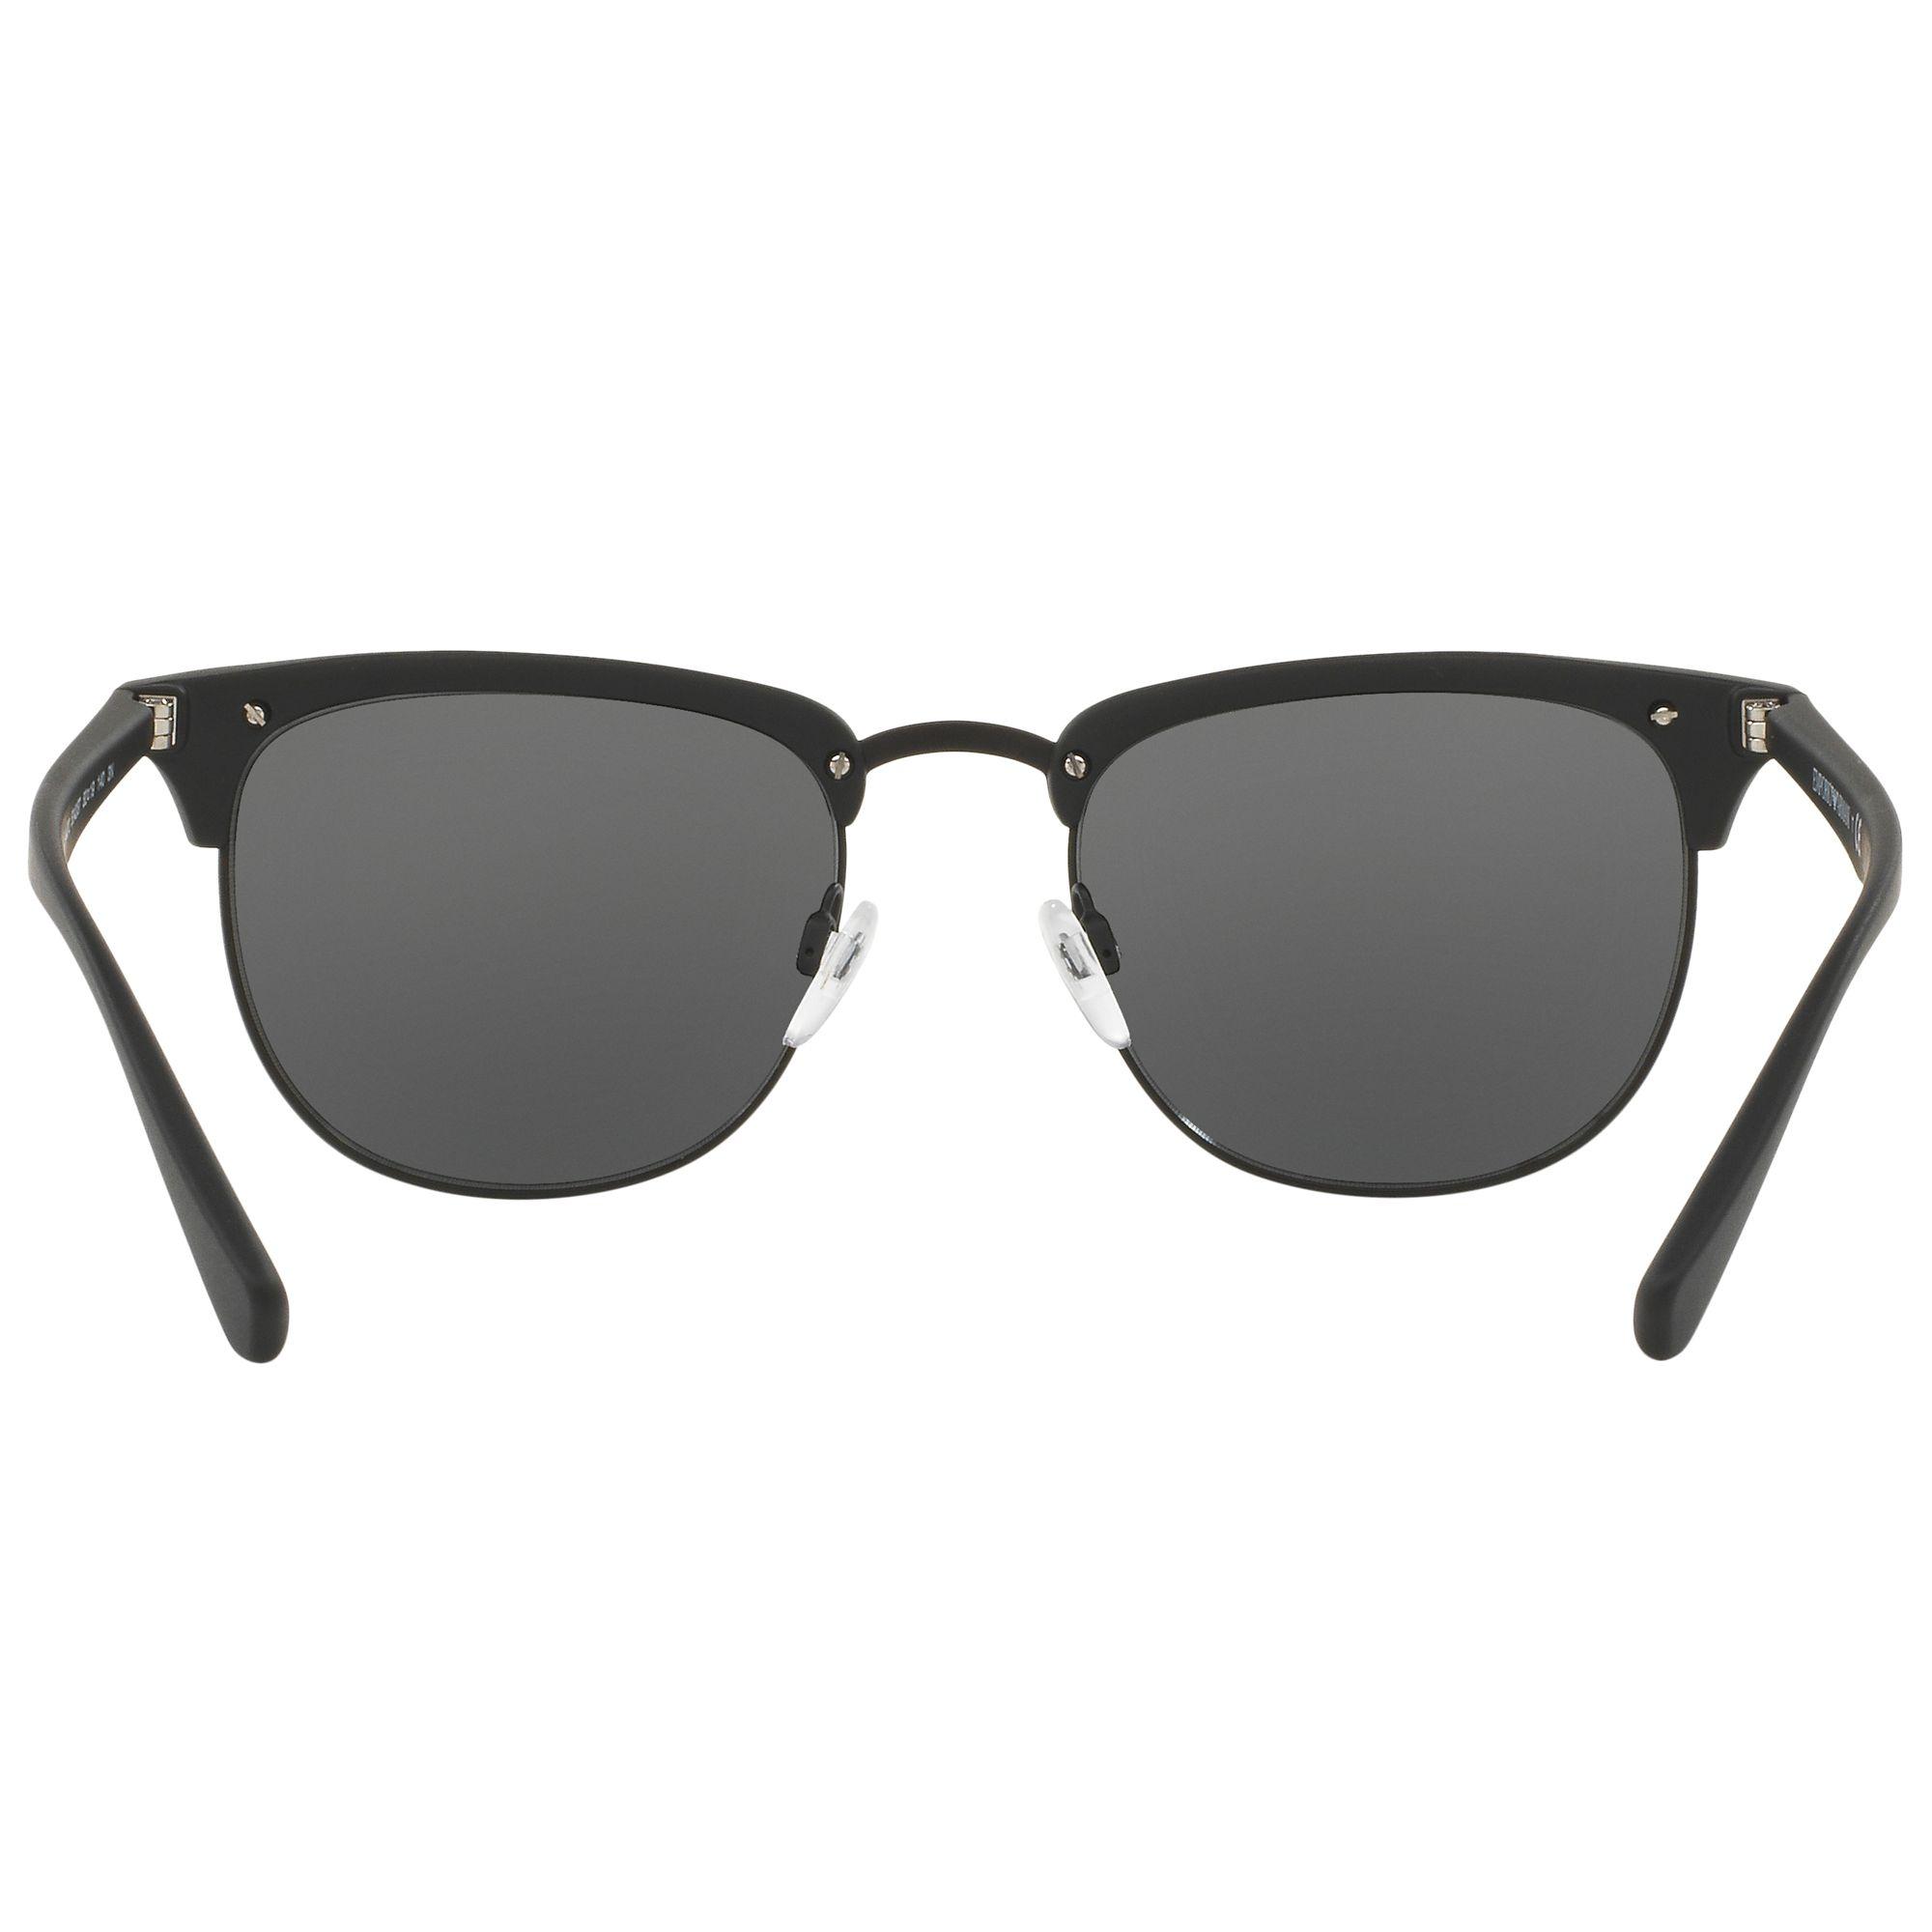 Buy Emporio Armani EA4072 Half Frame Oval Sunglasses ...